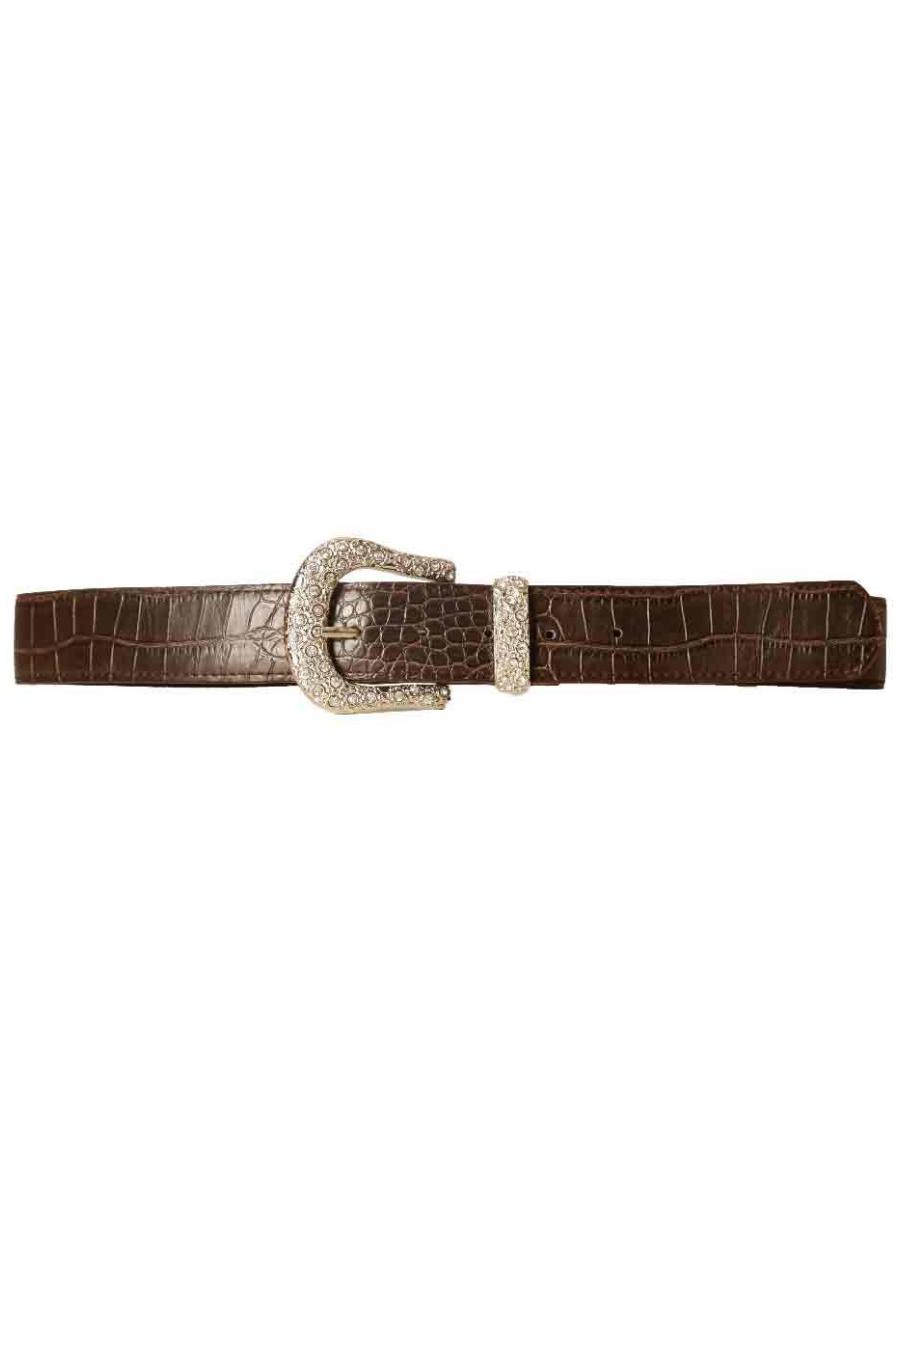 Brown crocodile-style belt with fancy rhinestone buckle D7288